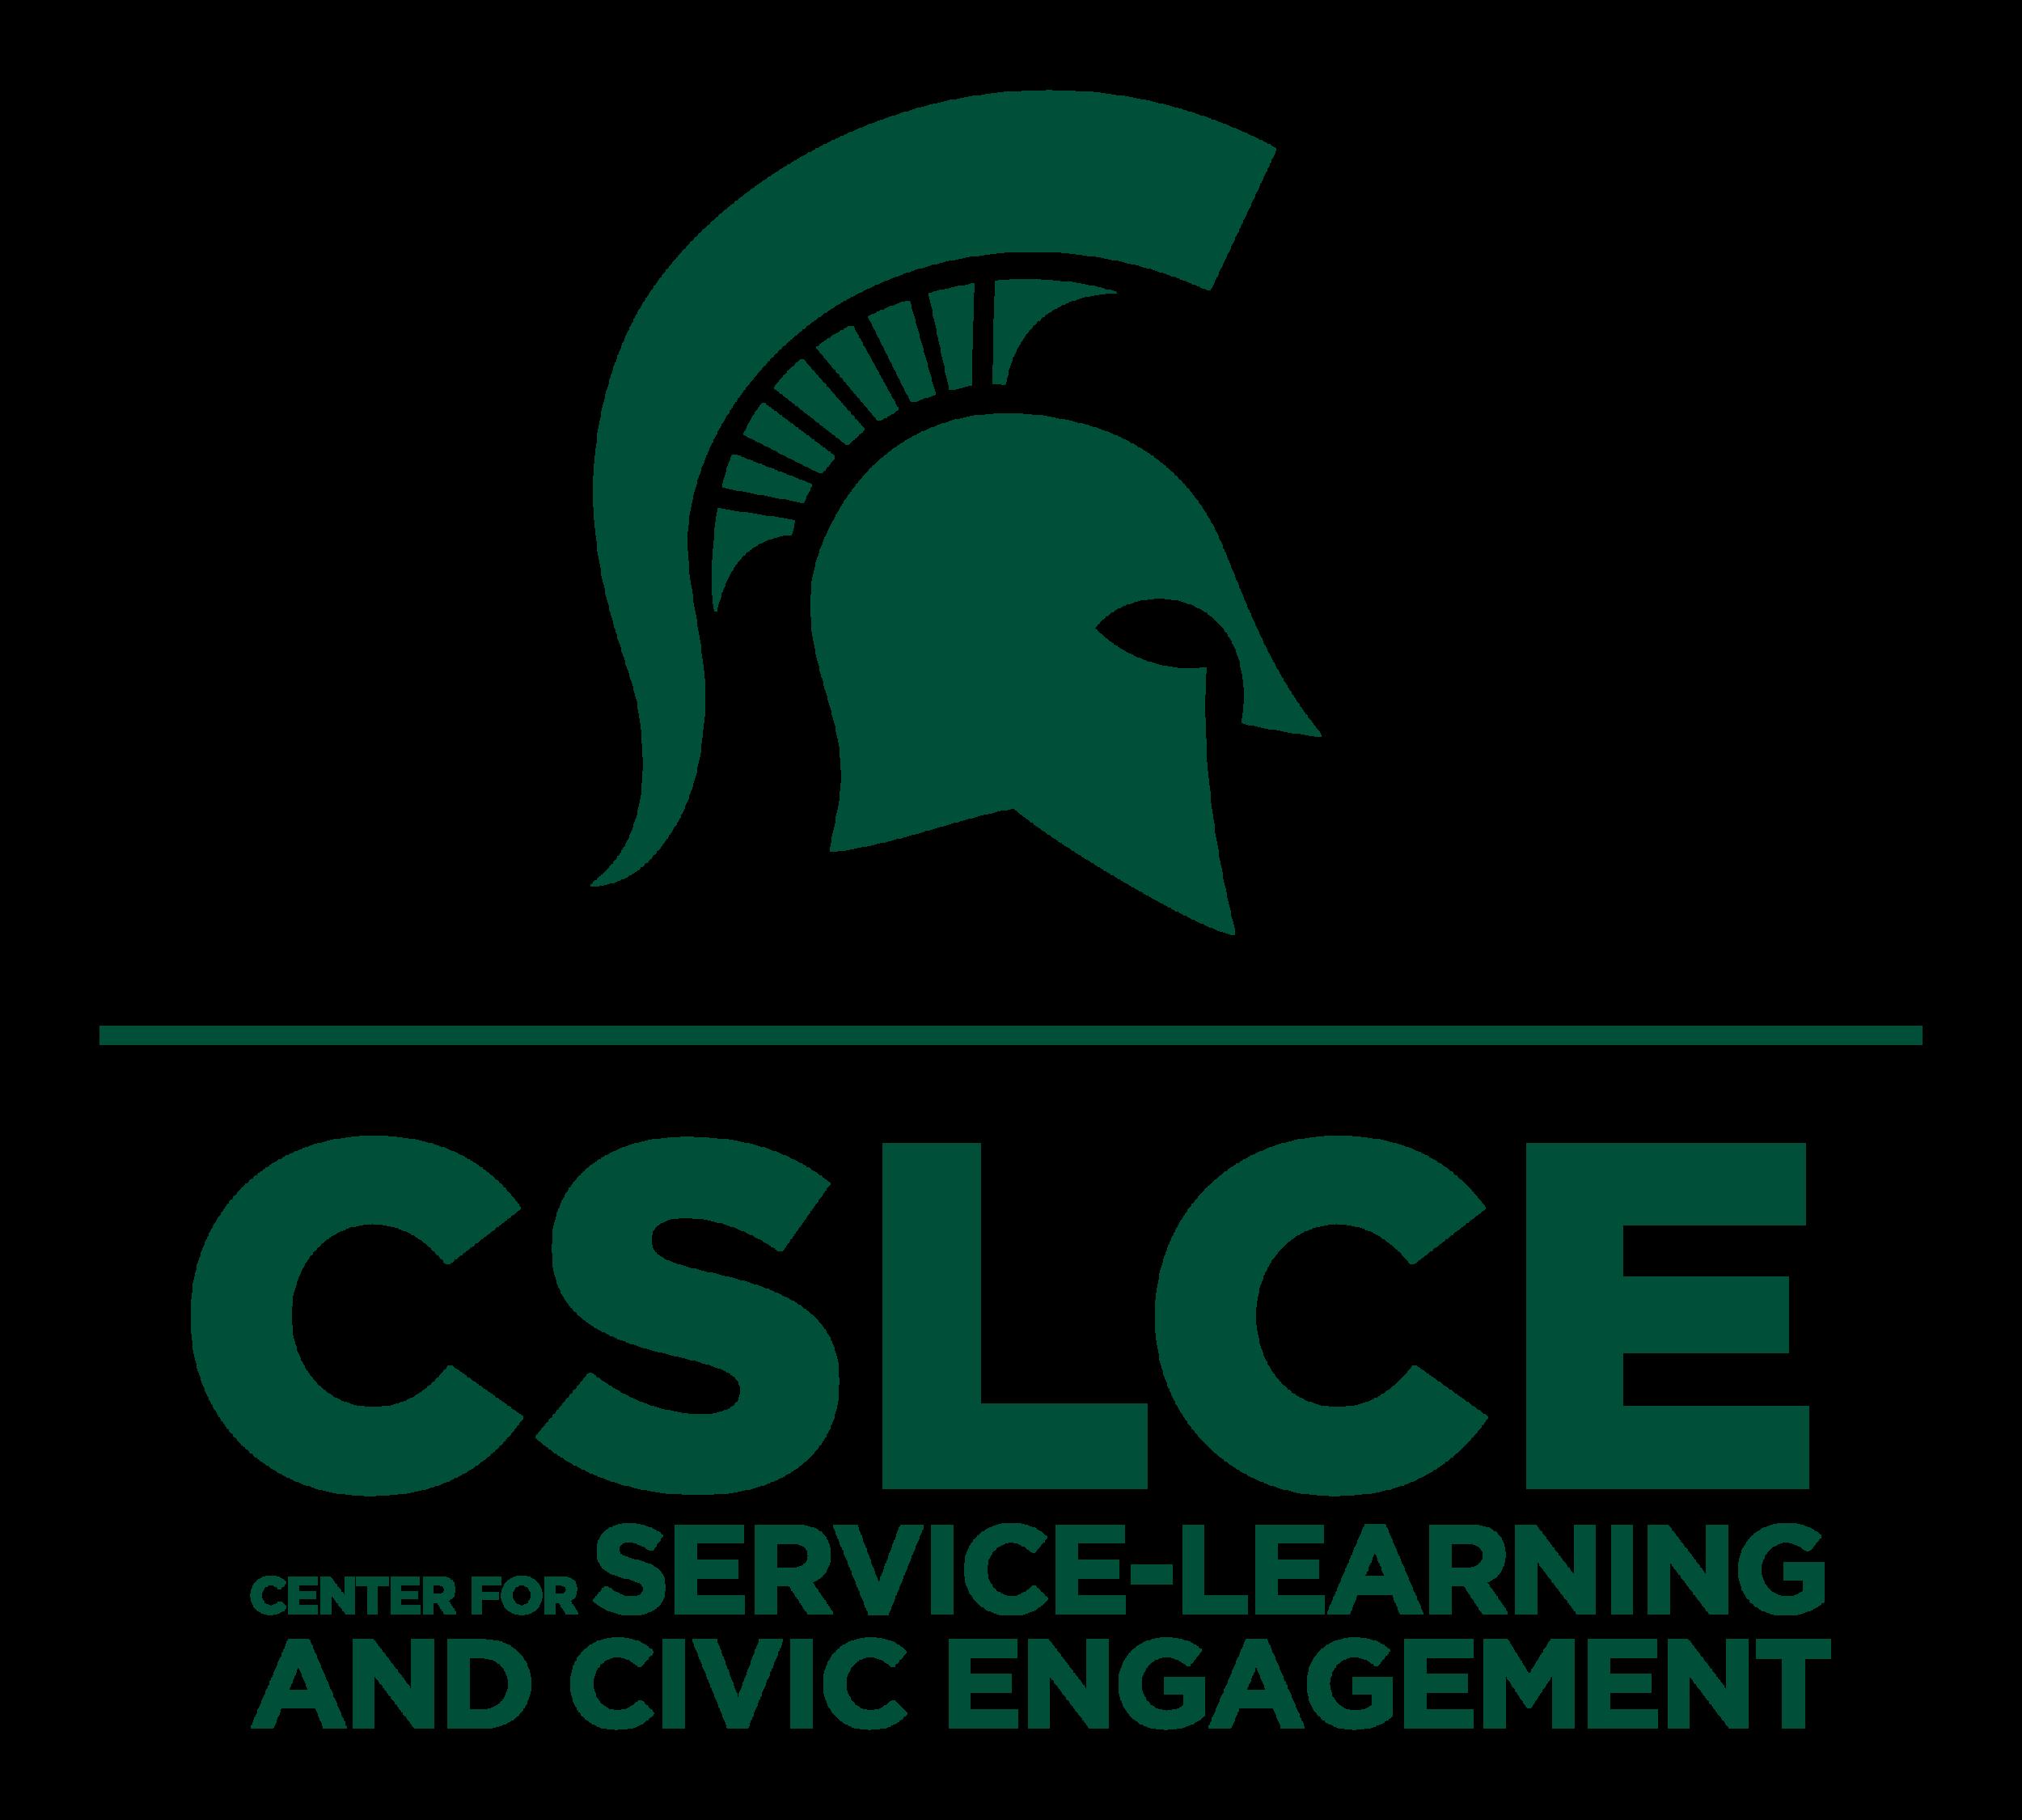 CSLCE-Graphic-Vertical-Color-wAcronym.png